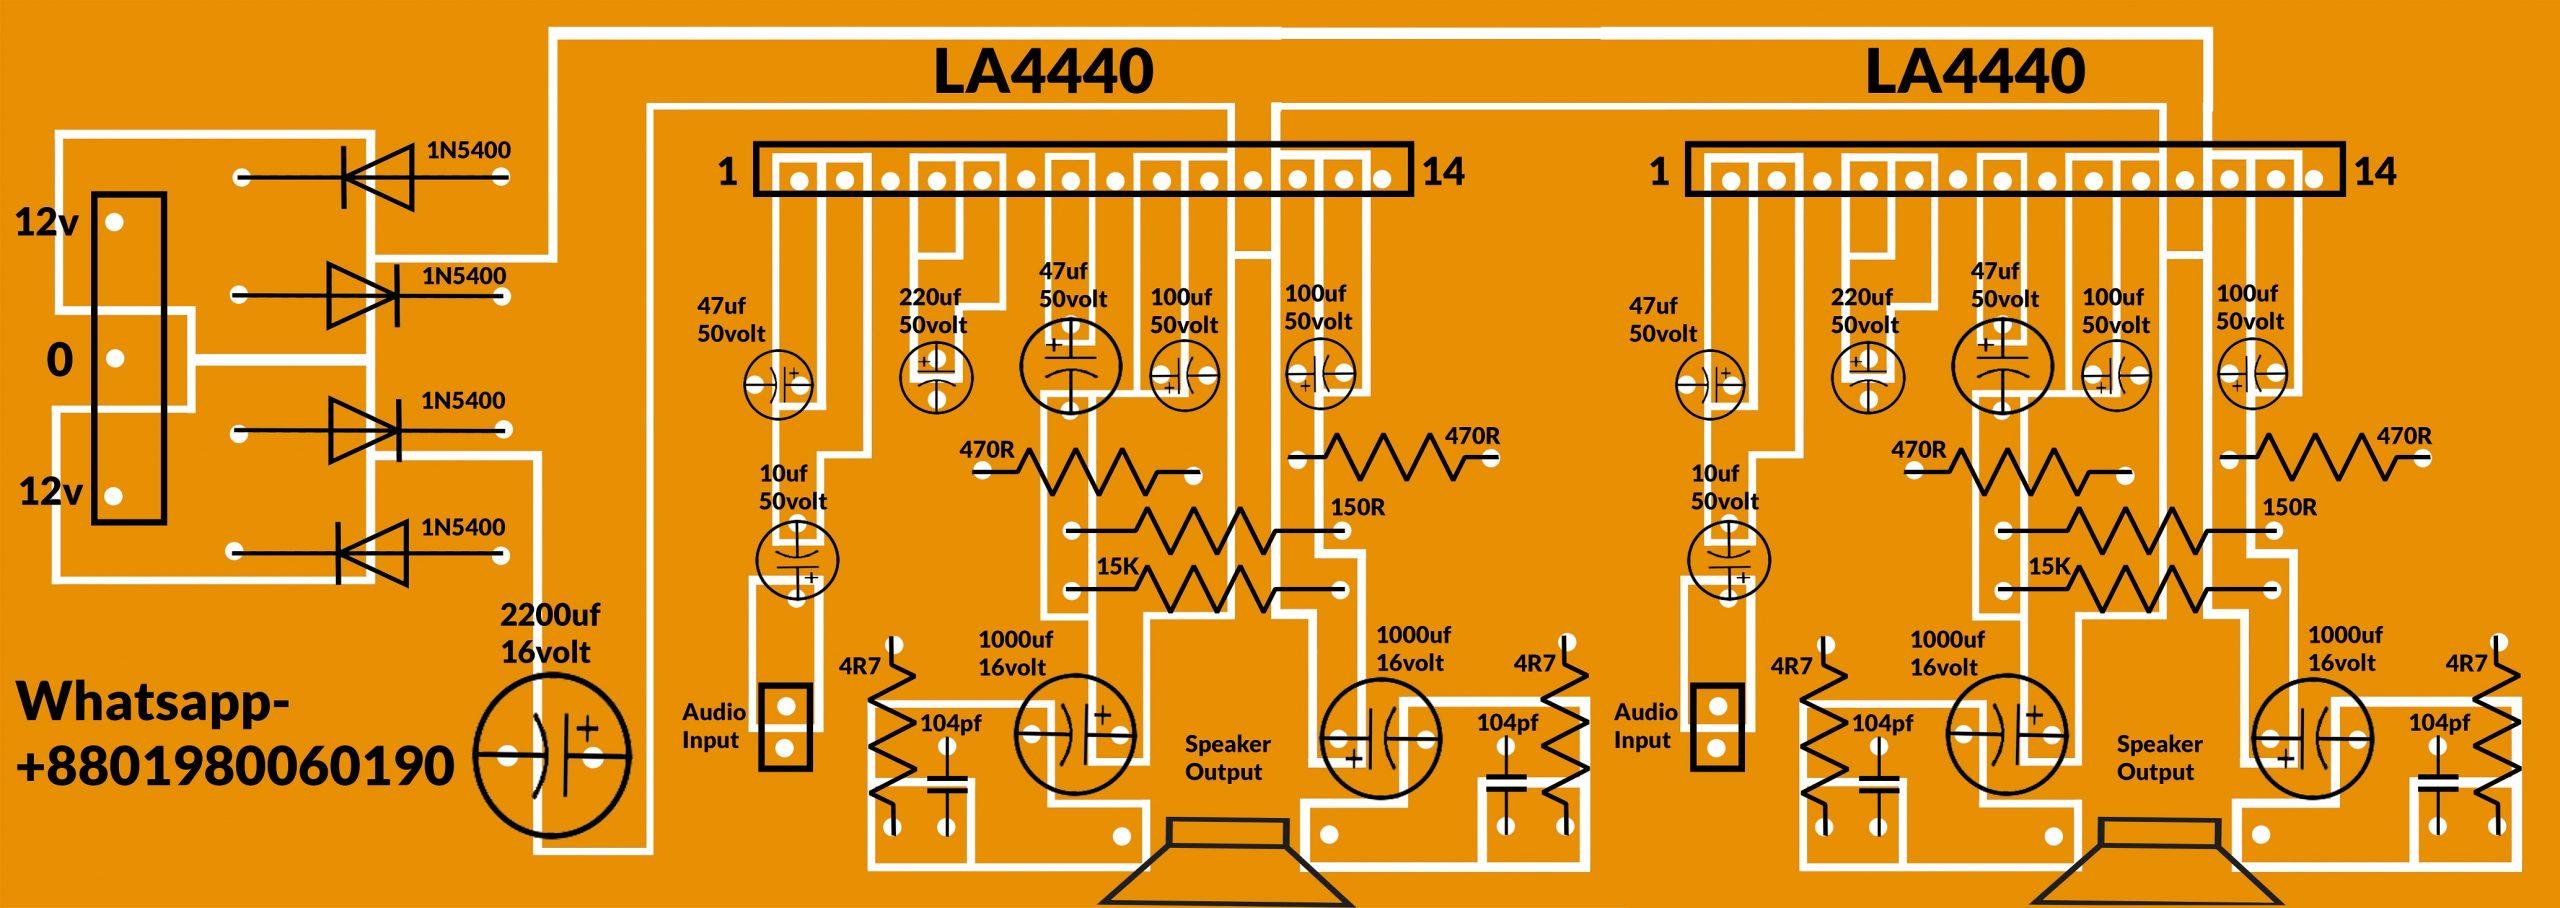 LA4440 stereo amplifier circuit